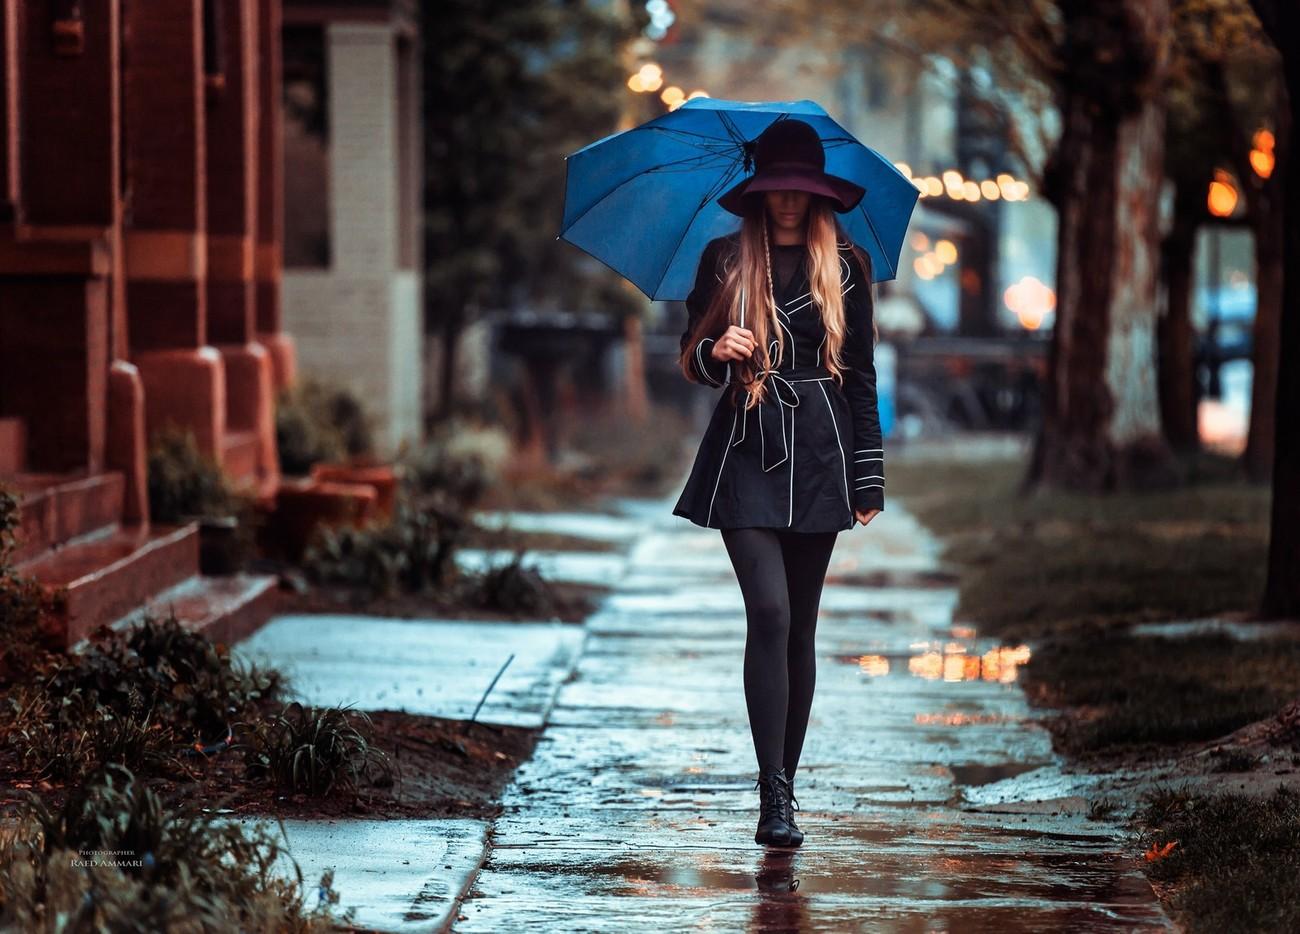 Where To Walk Dog On Rainy Day